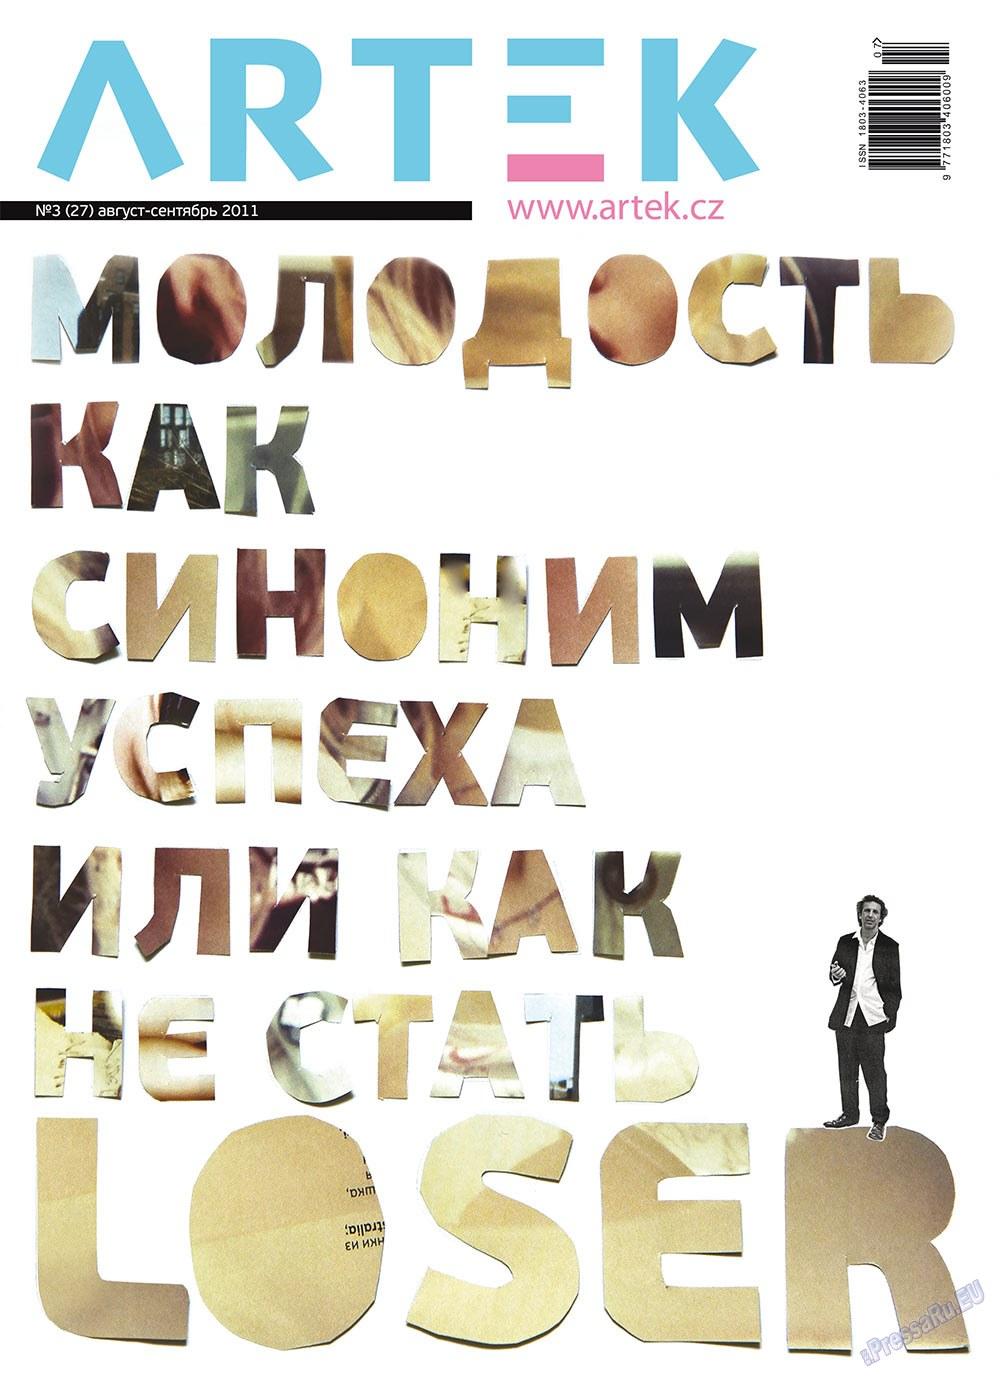 Артек (журнал). 2011 год, номер 3, стр. 1